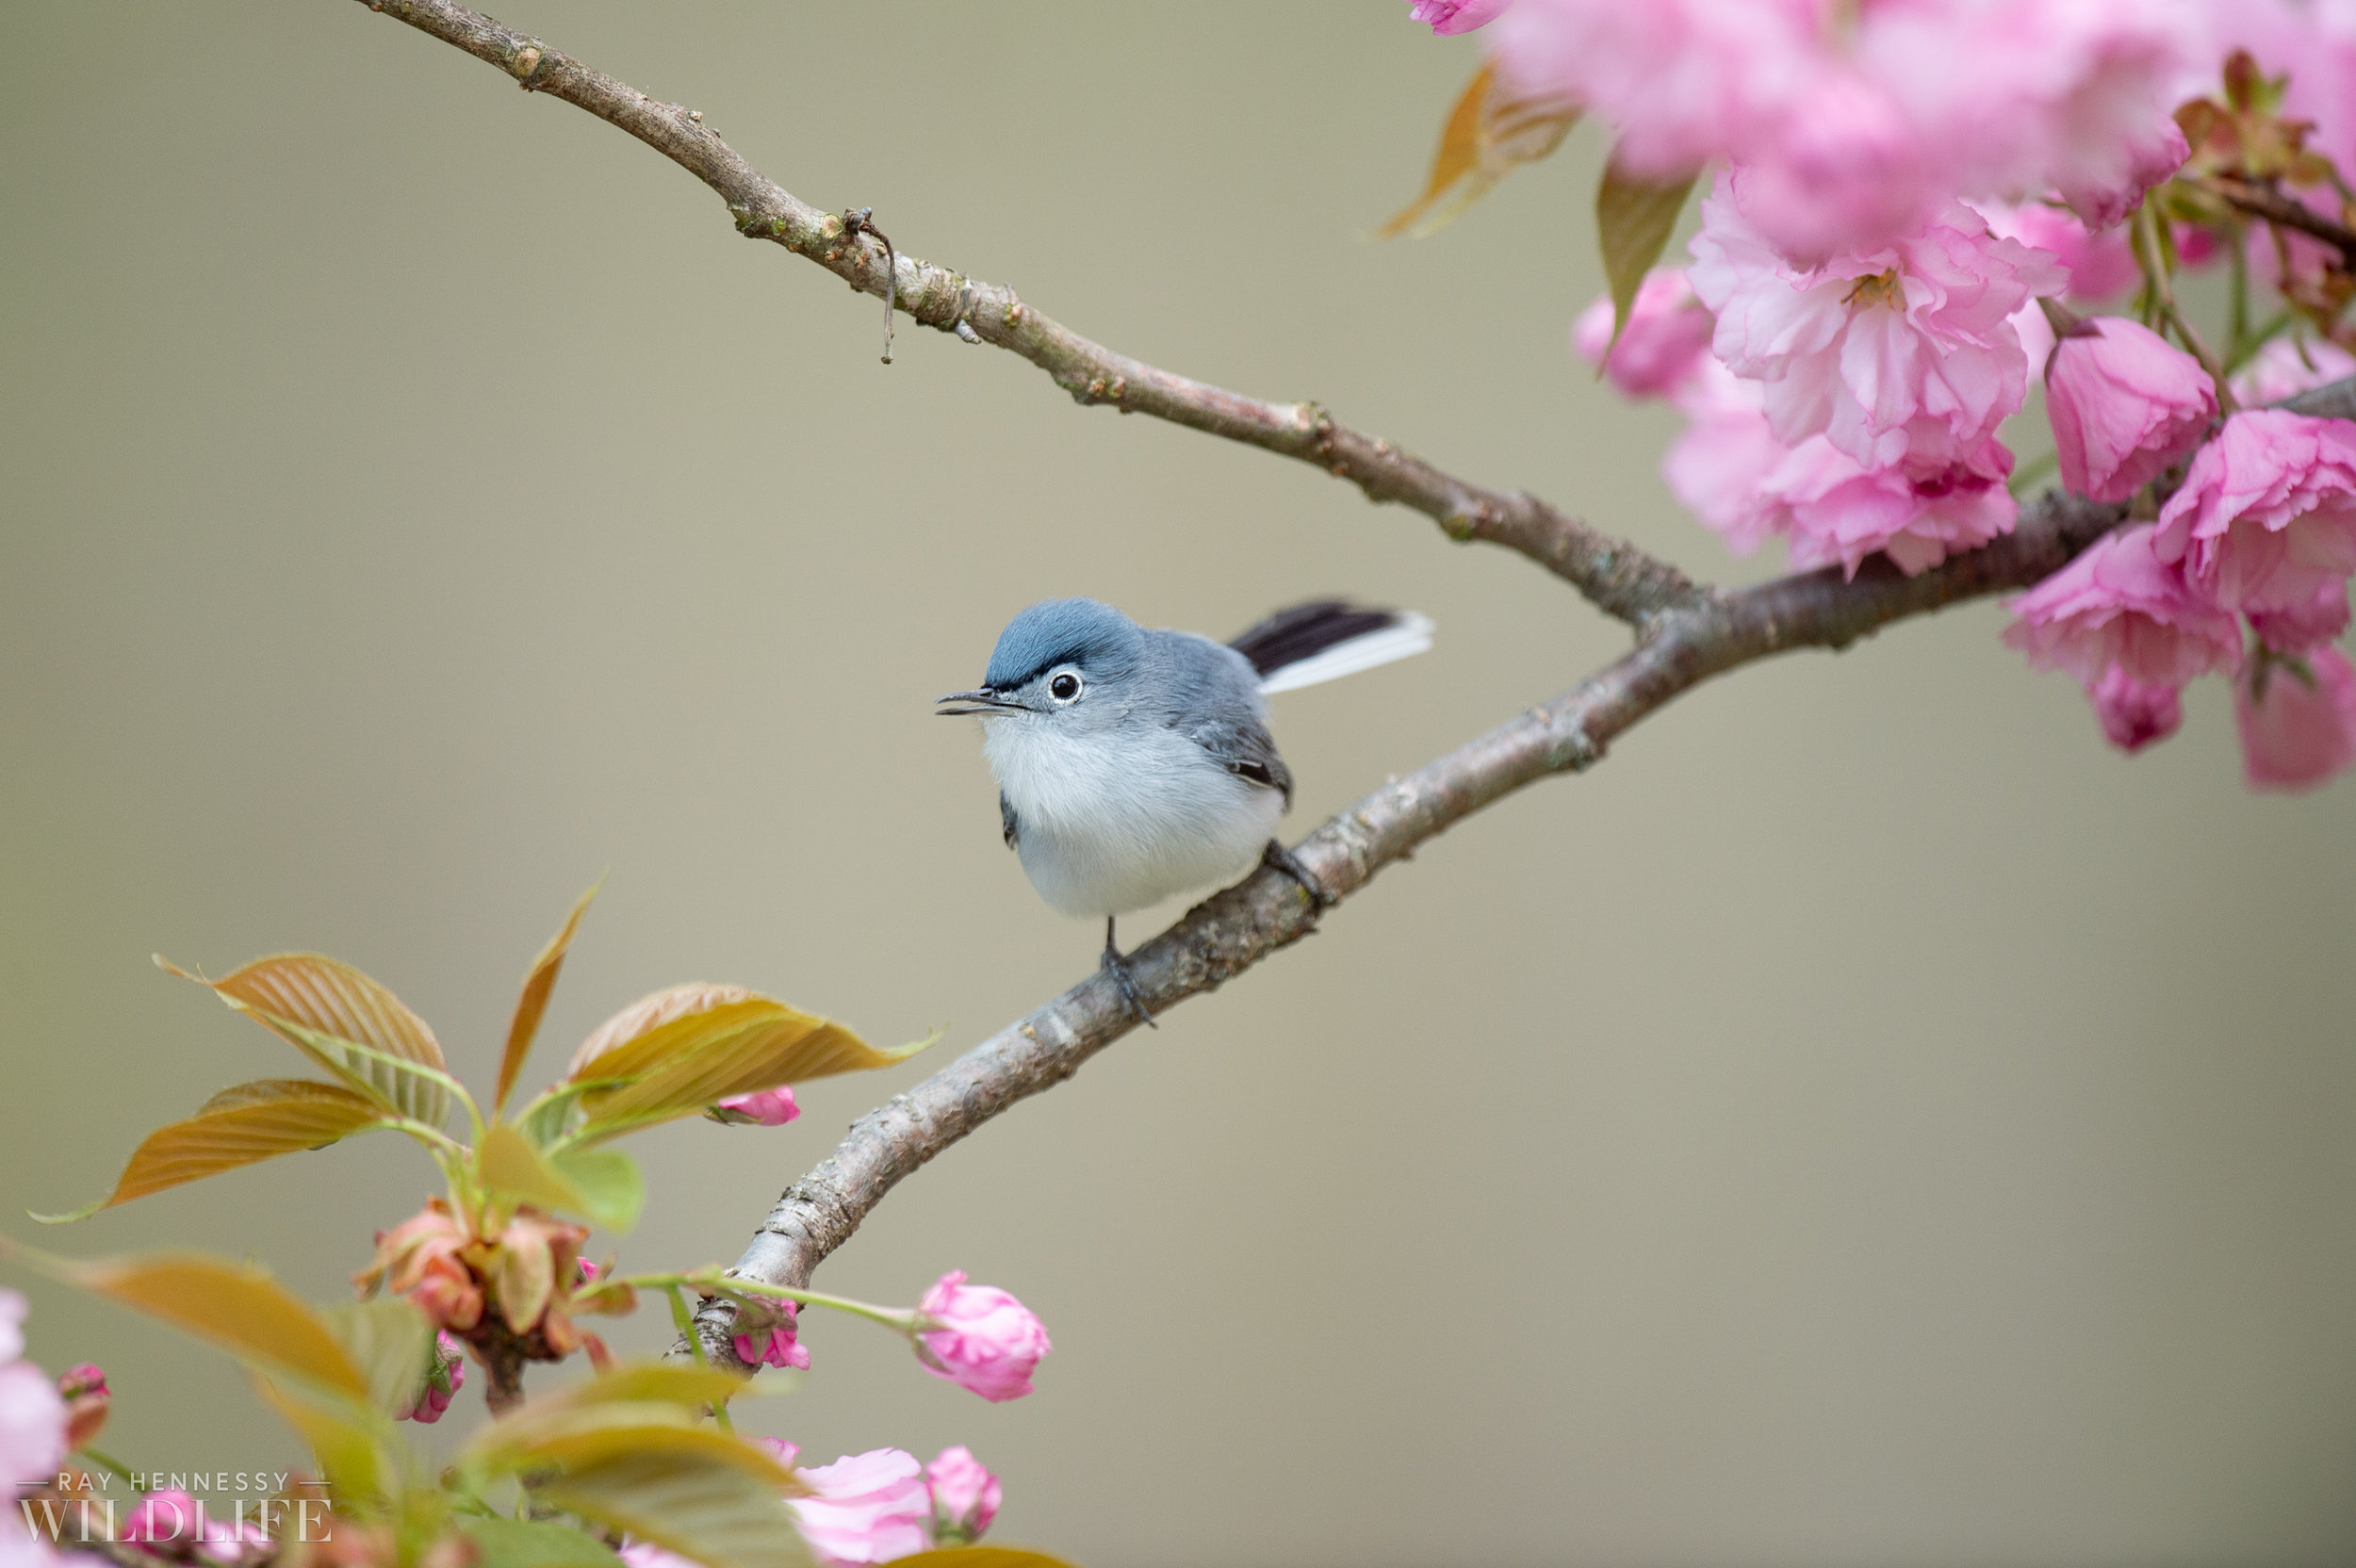 031_spring-warblers-new-jersey.jpg